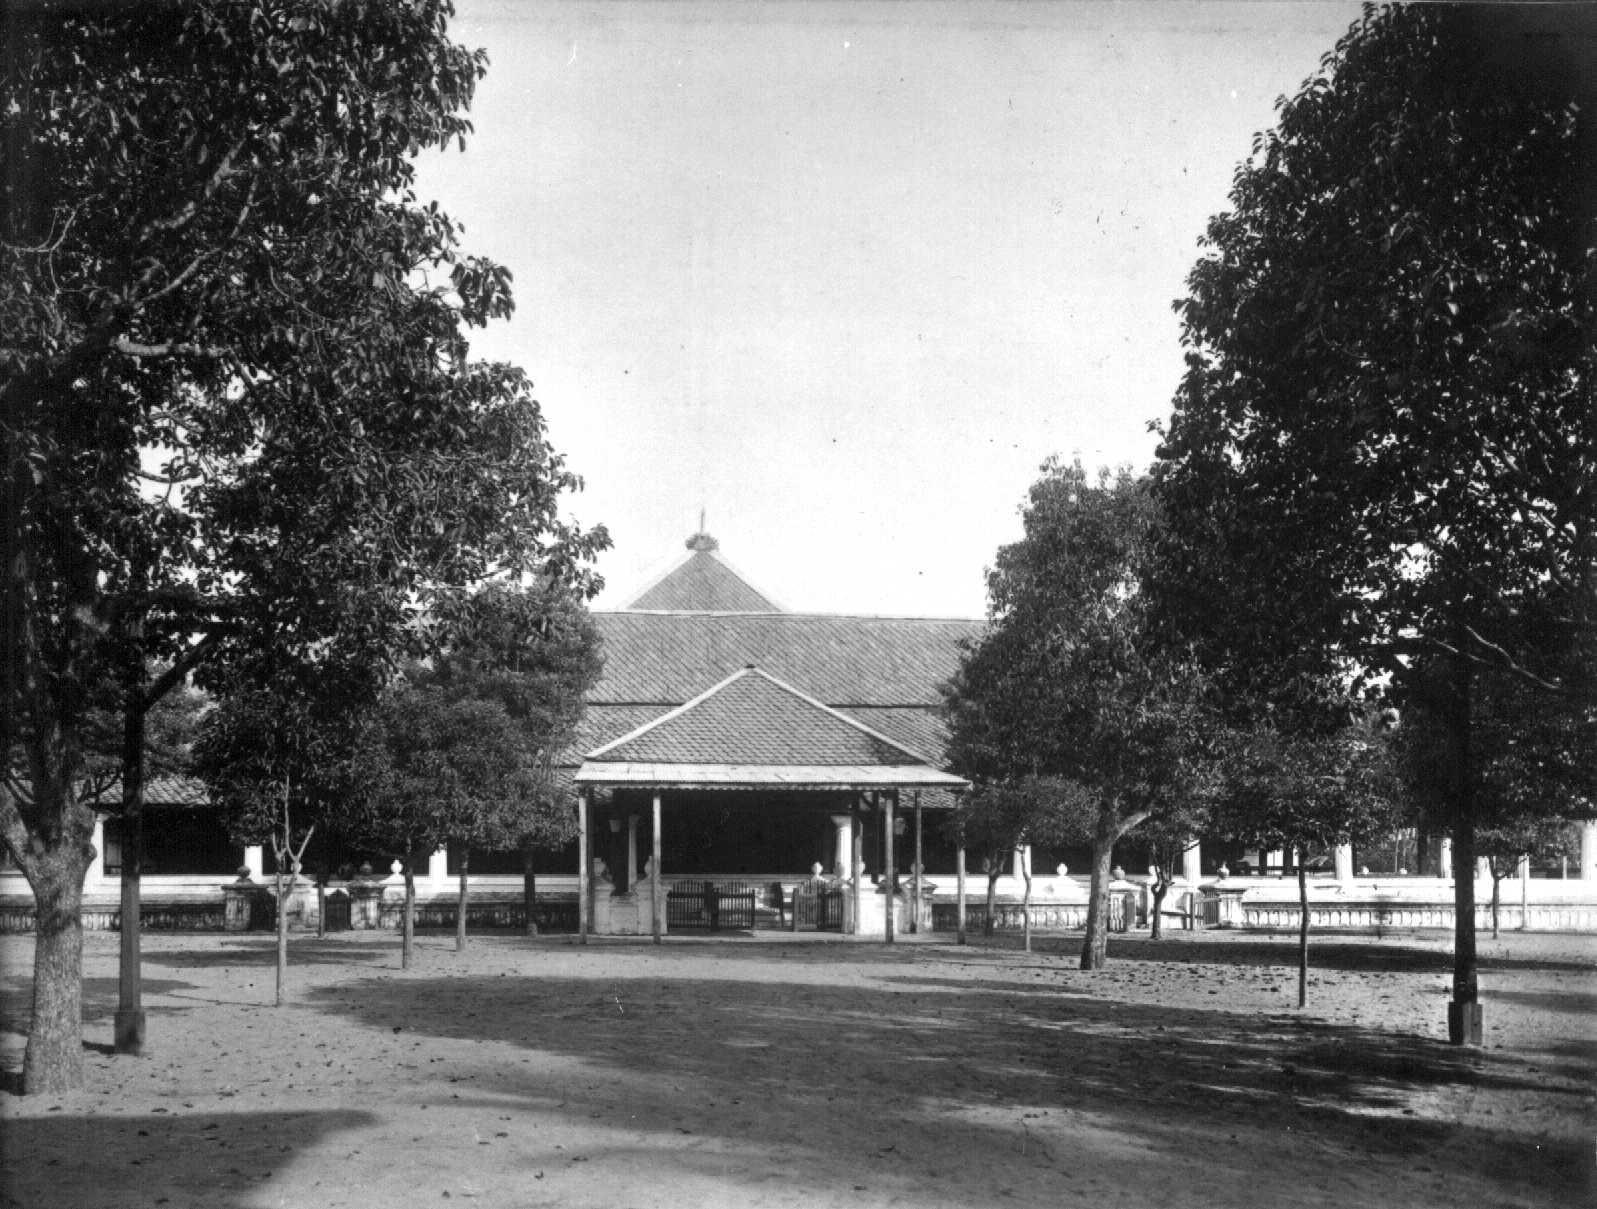 Masjid Agung Surakarta (1)